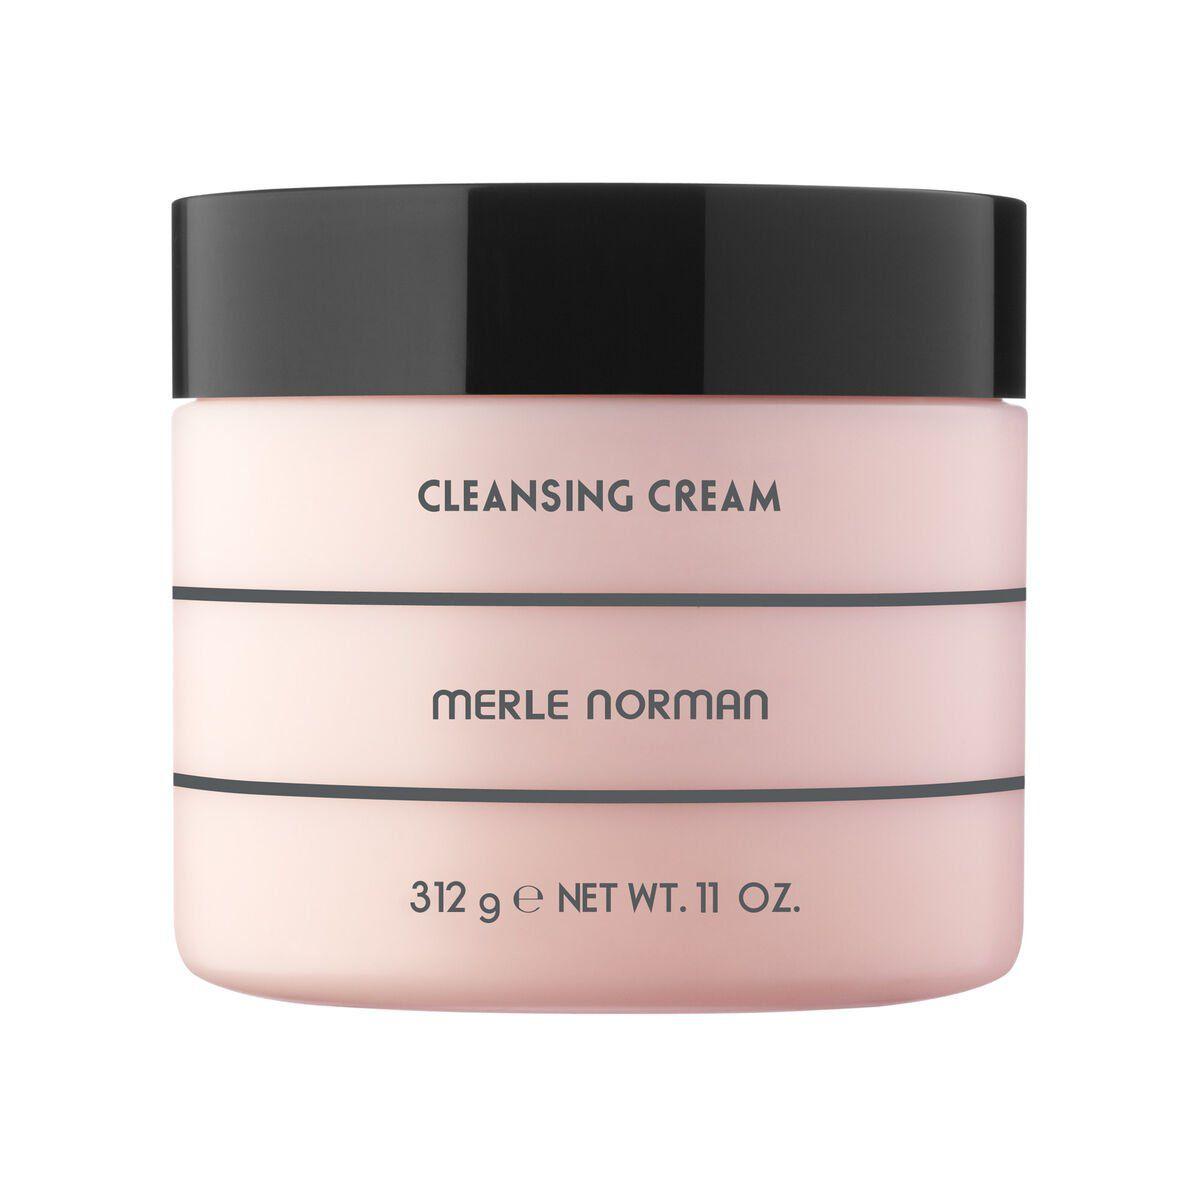 Merle Norman Cleansing Cream